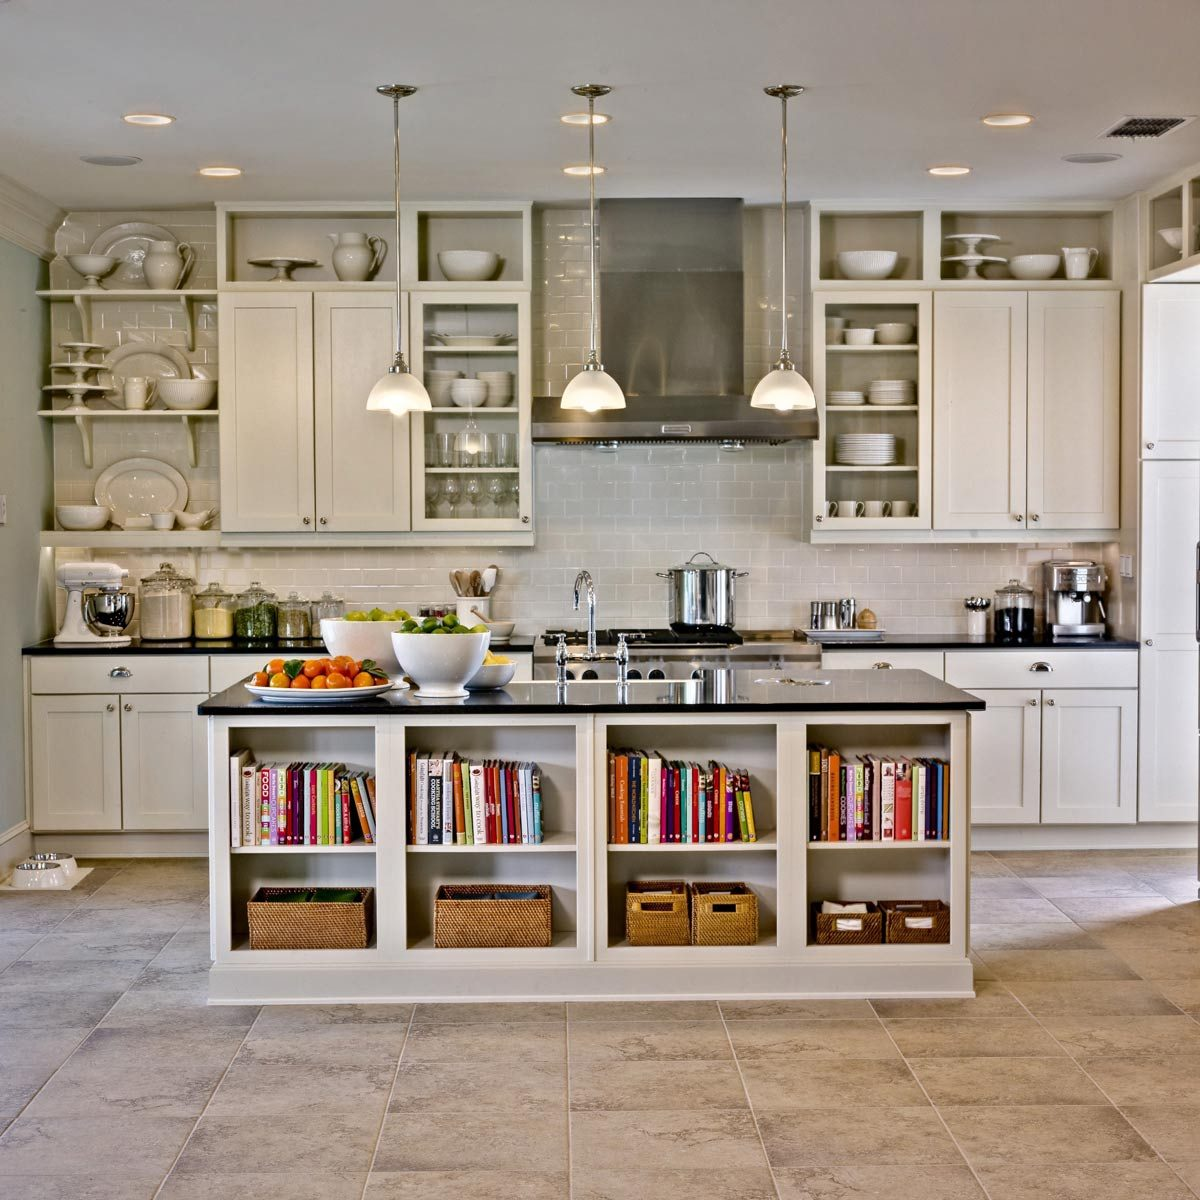 Fullsize Of Kitchen Islands Ideas